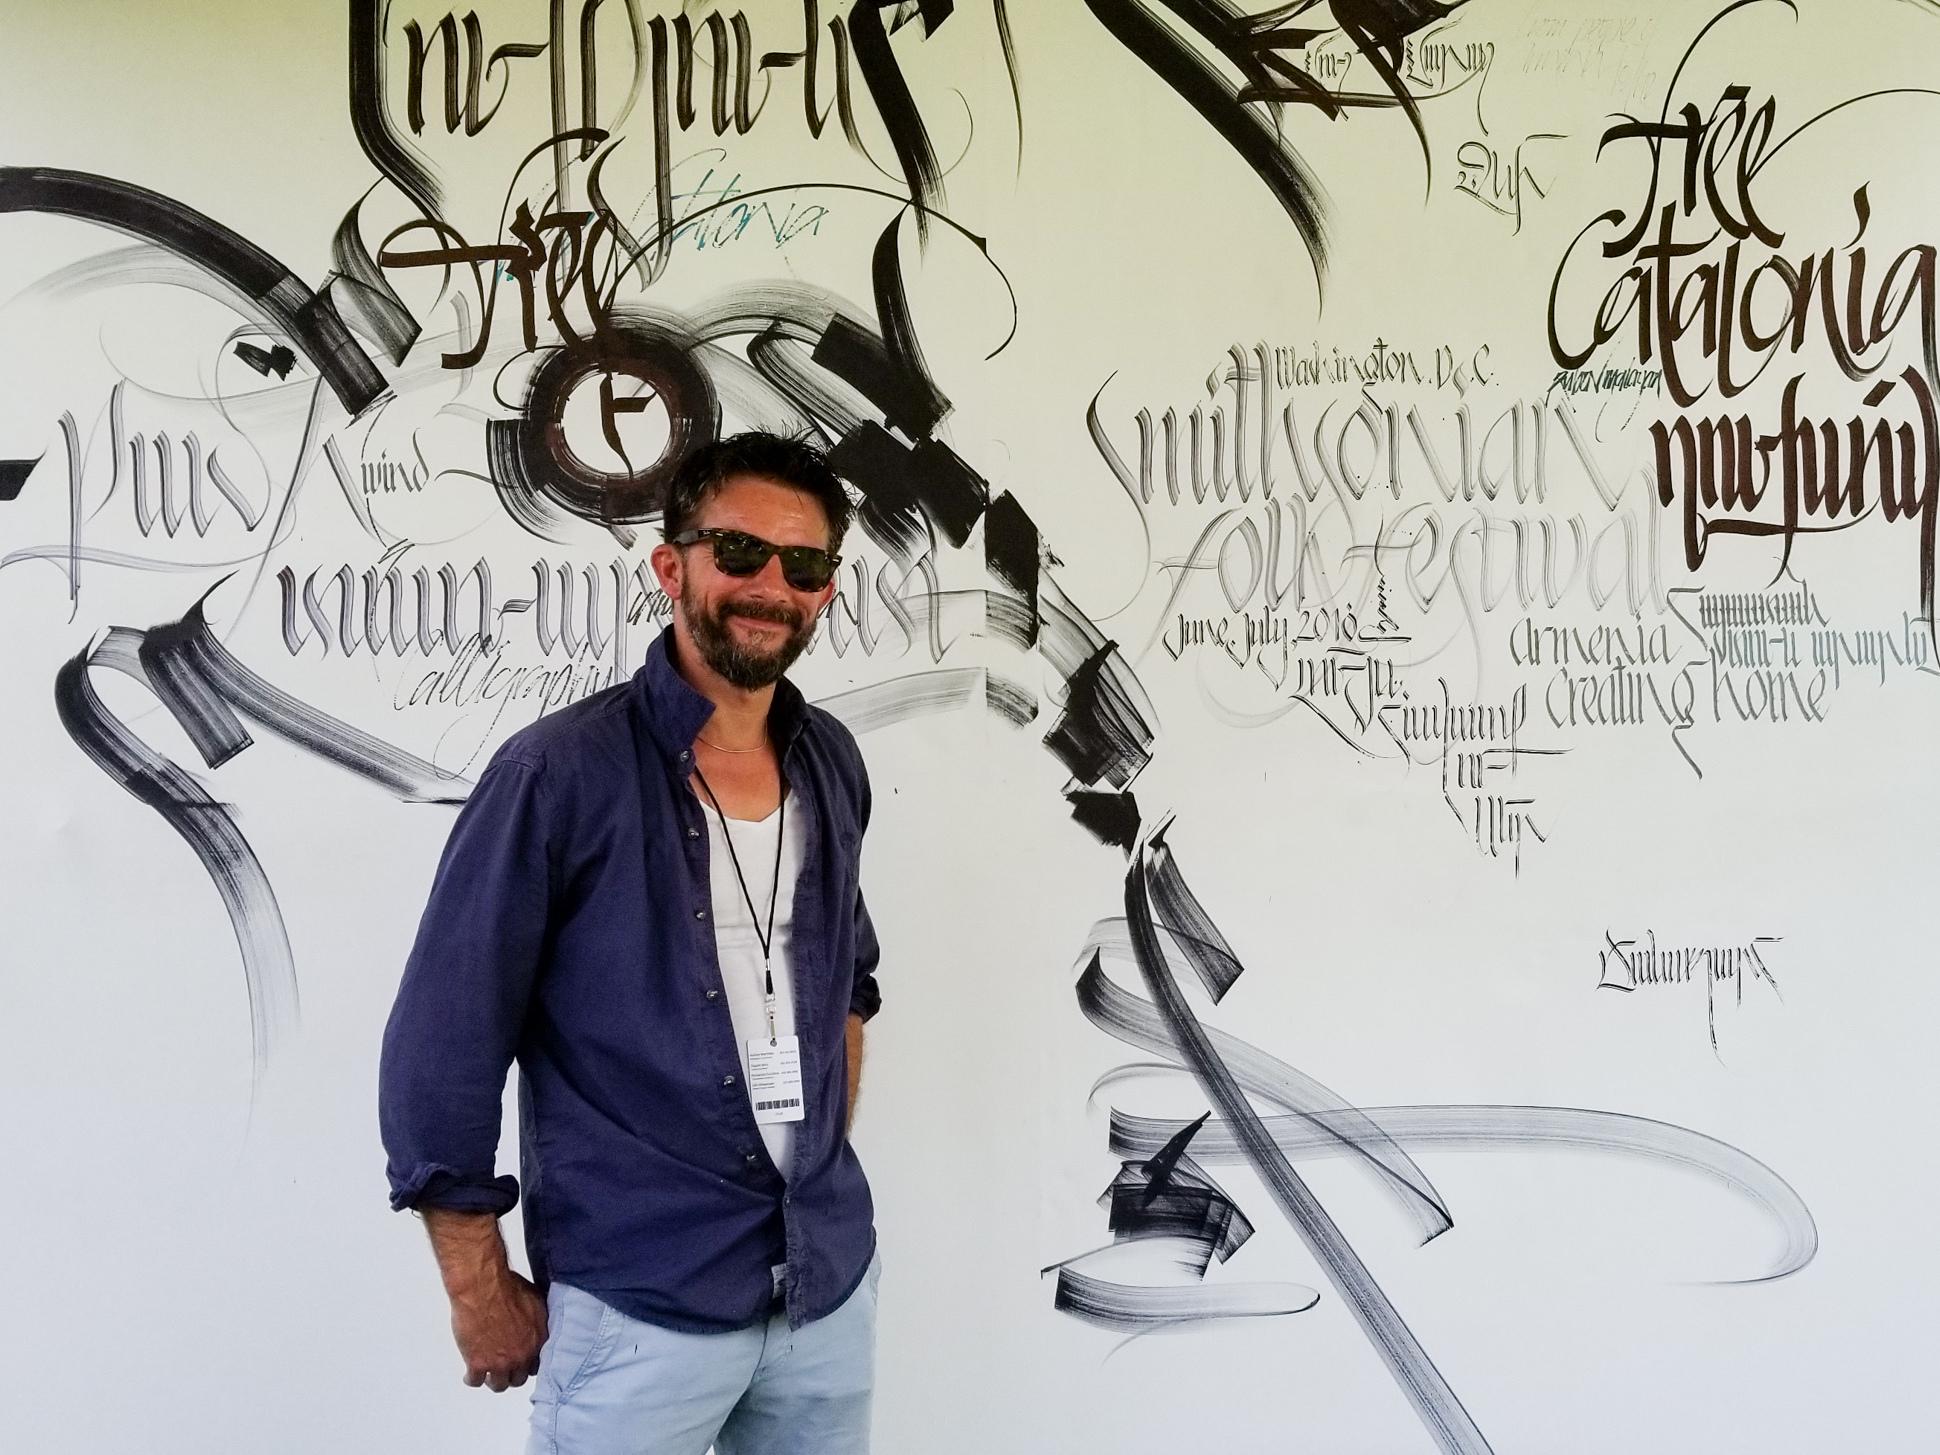 The 'Pop Art' Of Armenia's Revolution Is ... Calligraphy?